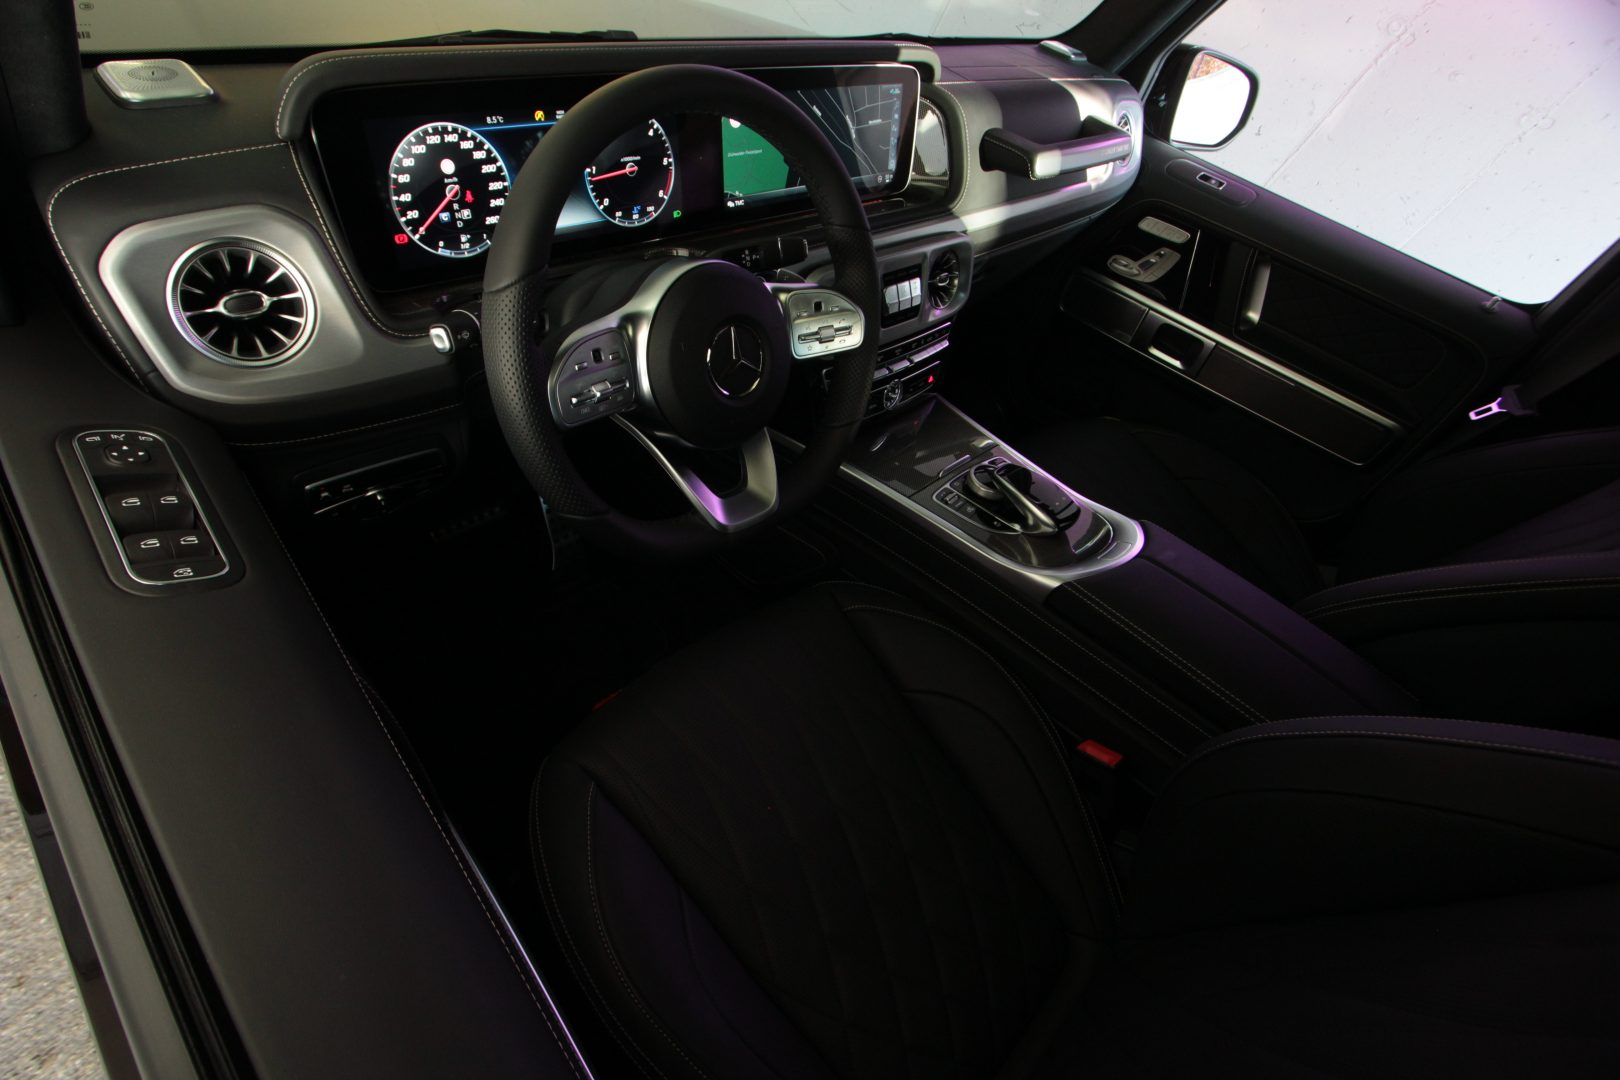 AIL Mercedes-Benz G 400 d Stronger than time Edition 8